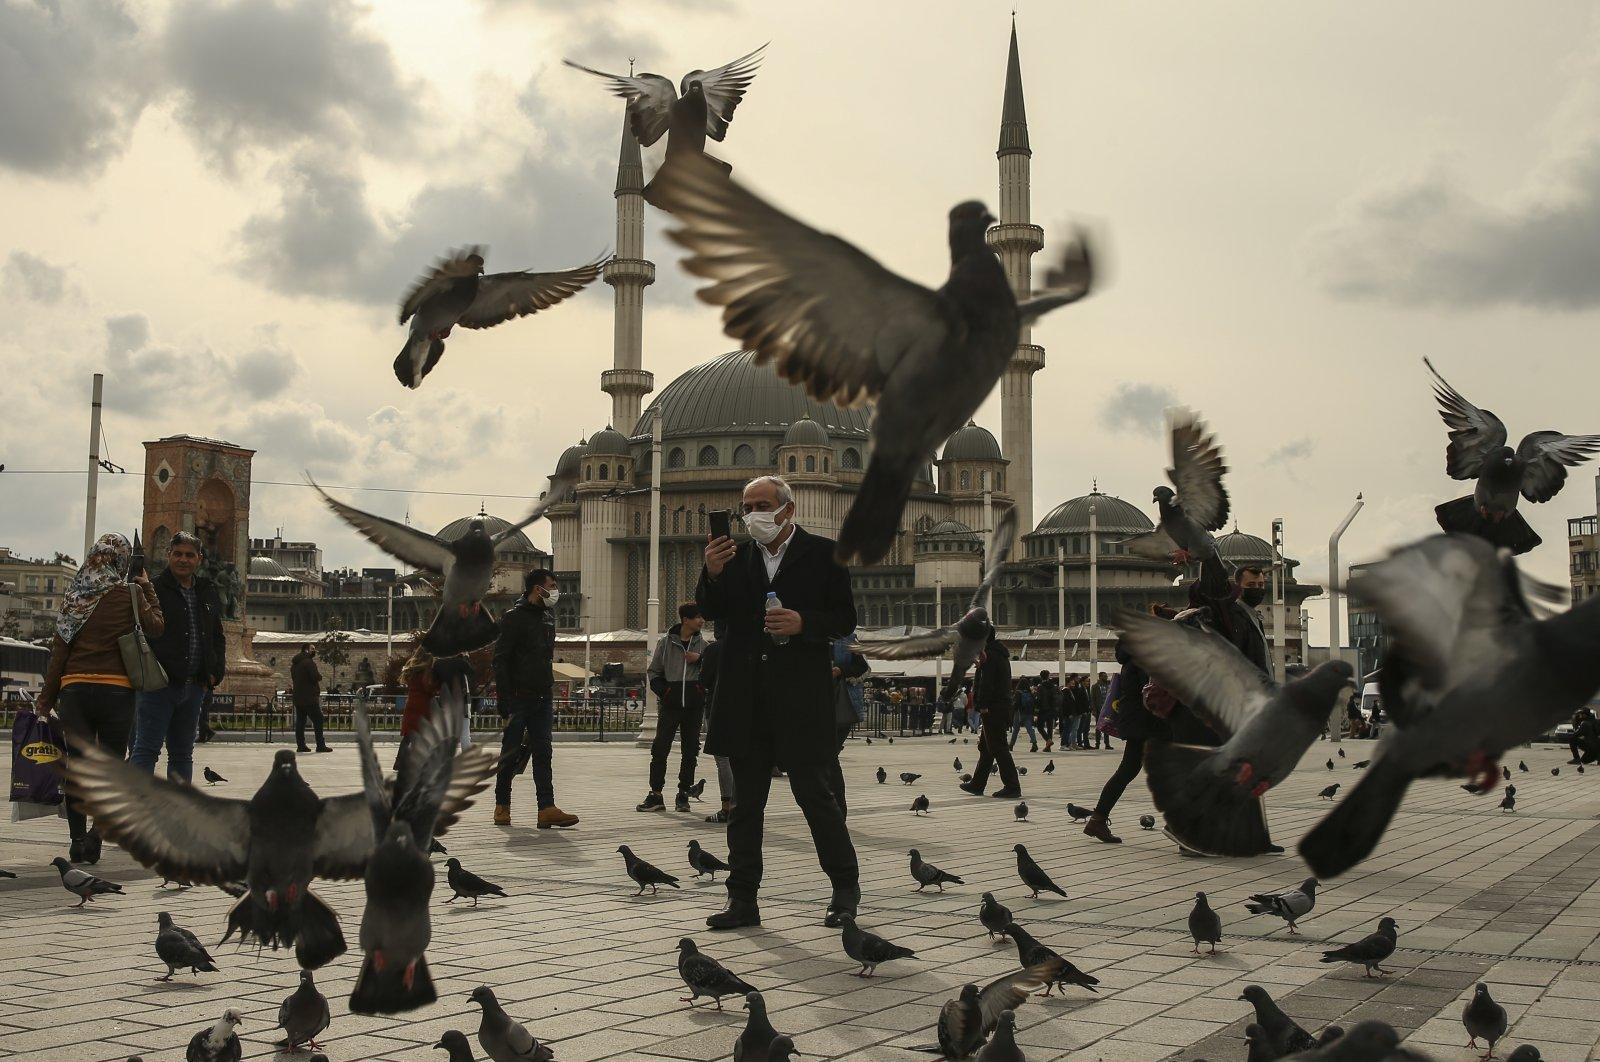 A man feeds pigeons amid the coronavirus pandemic, at Taksim Square, Istanbul, Turkey, March 25, 2021. (AP Photo)